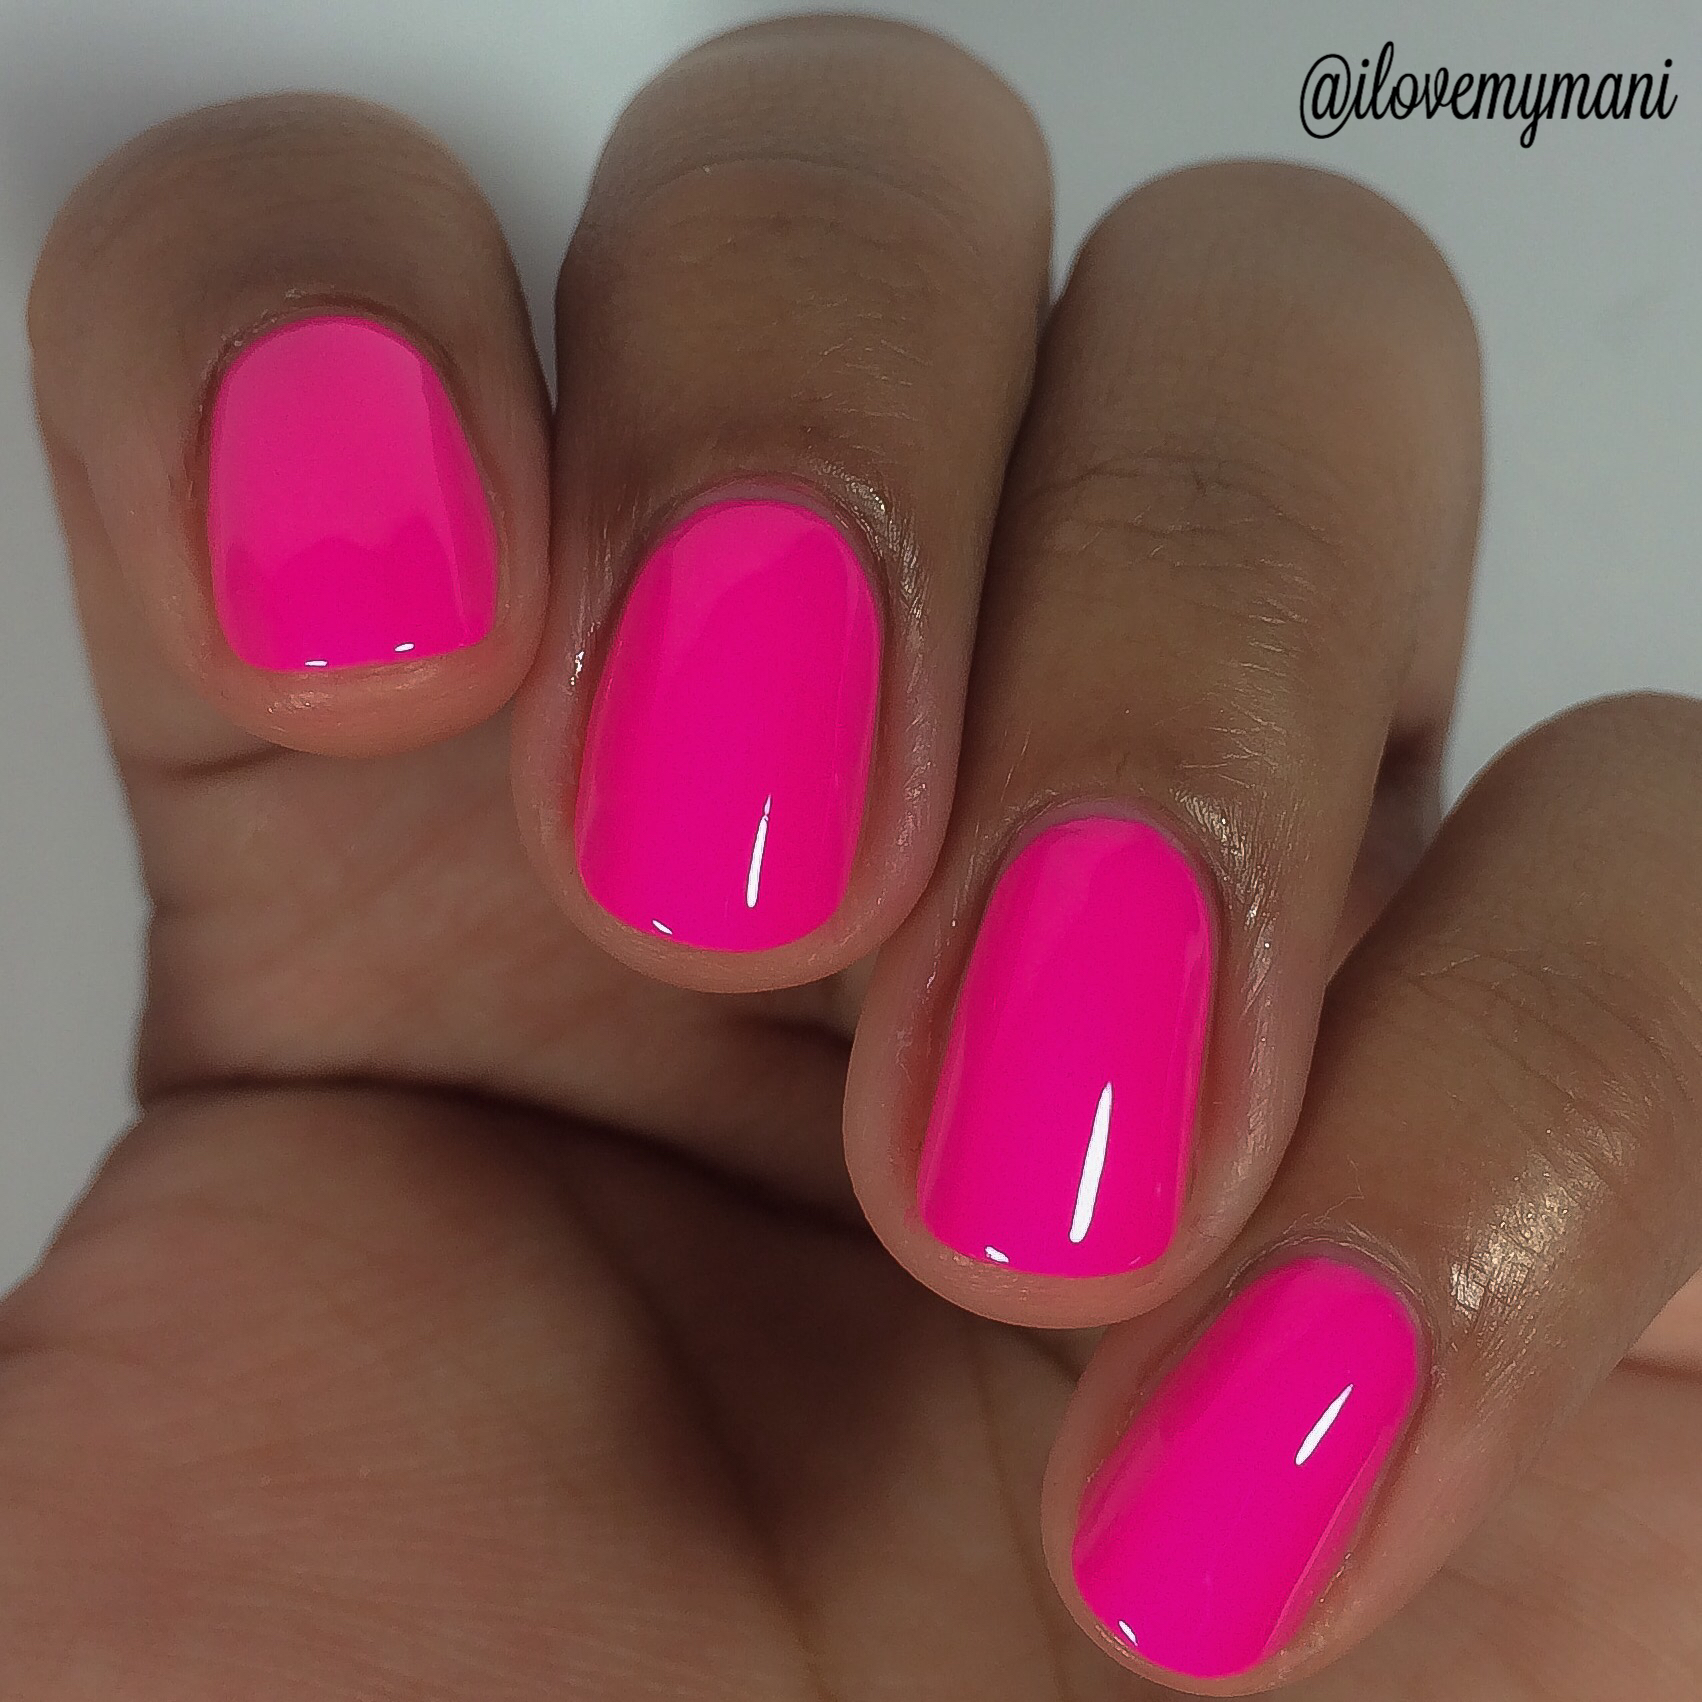 color club nail polish | i love my mani